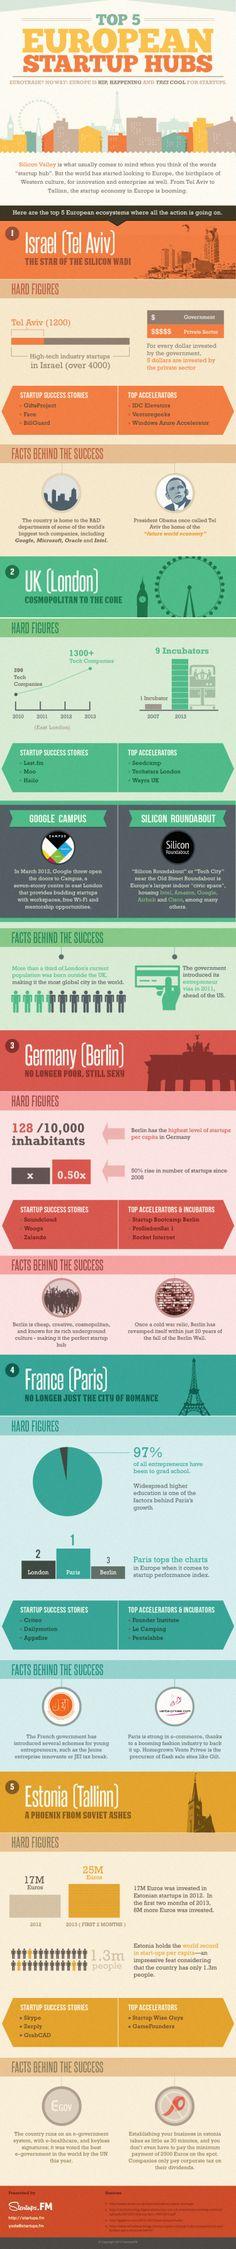 Top 5 European Start-up Hubs Infographic